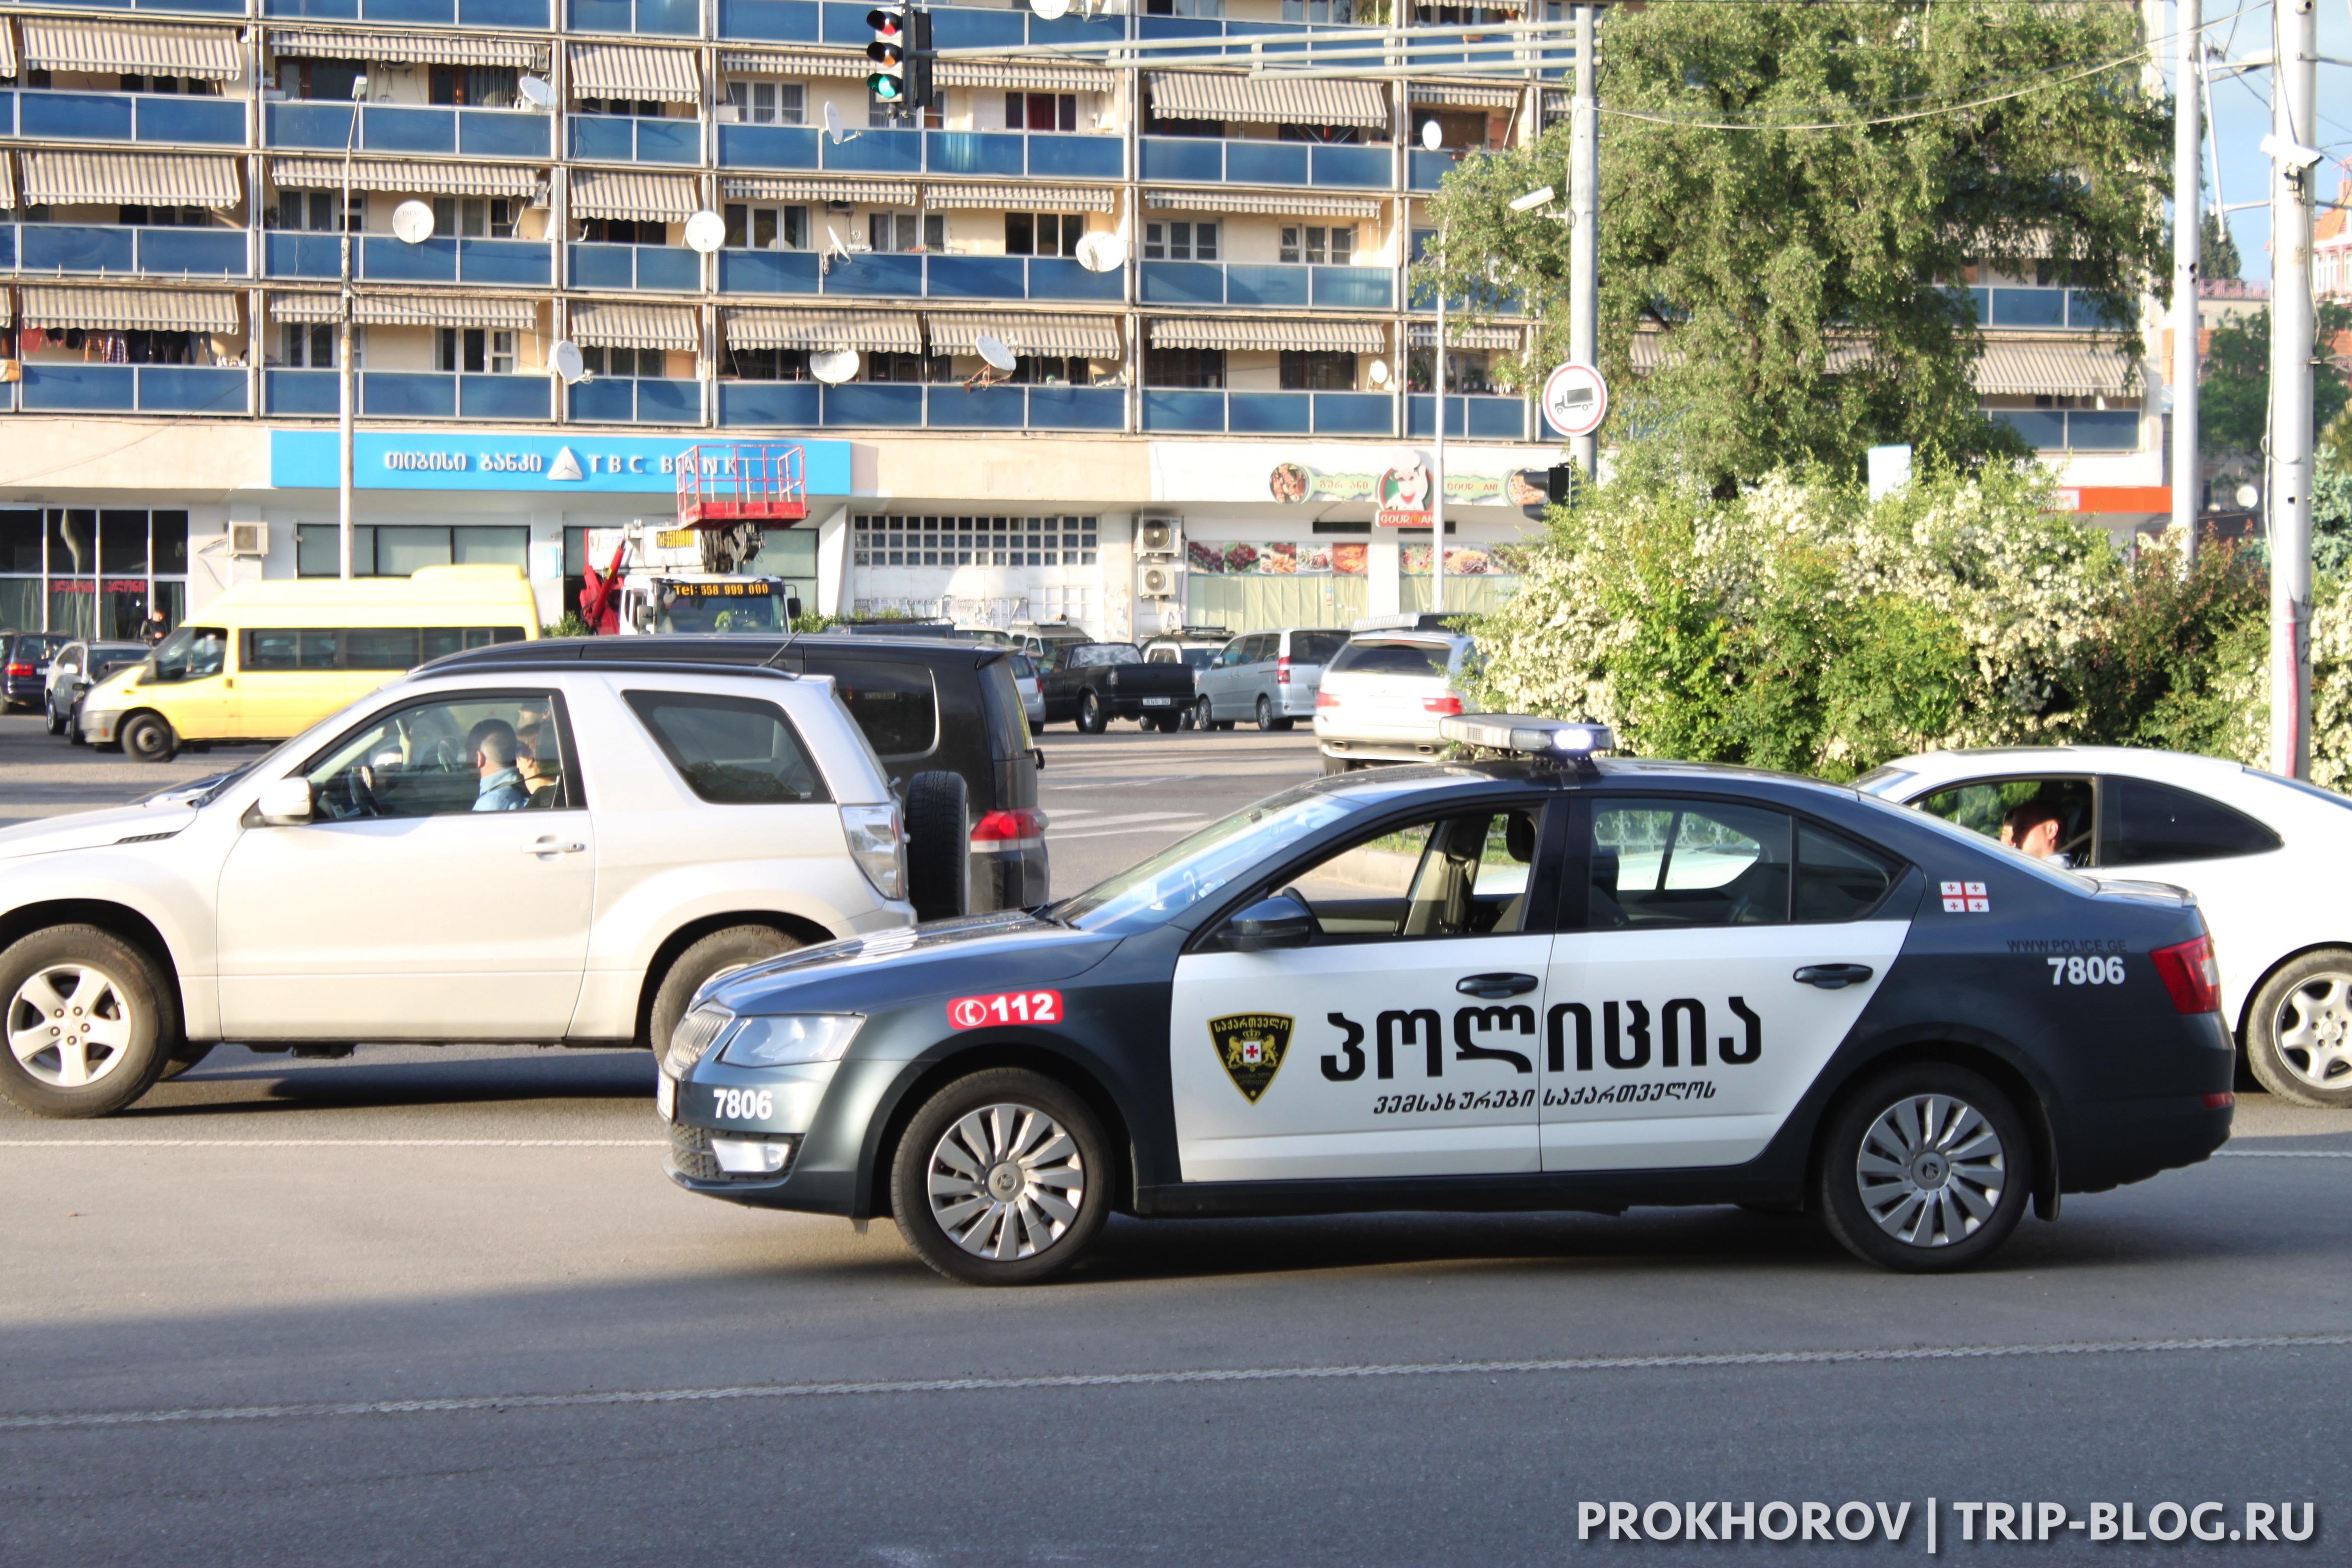 bezopasnost-v-gruzii